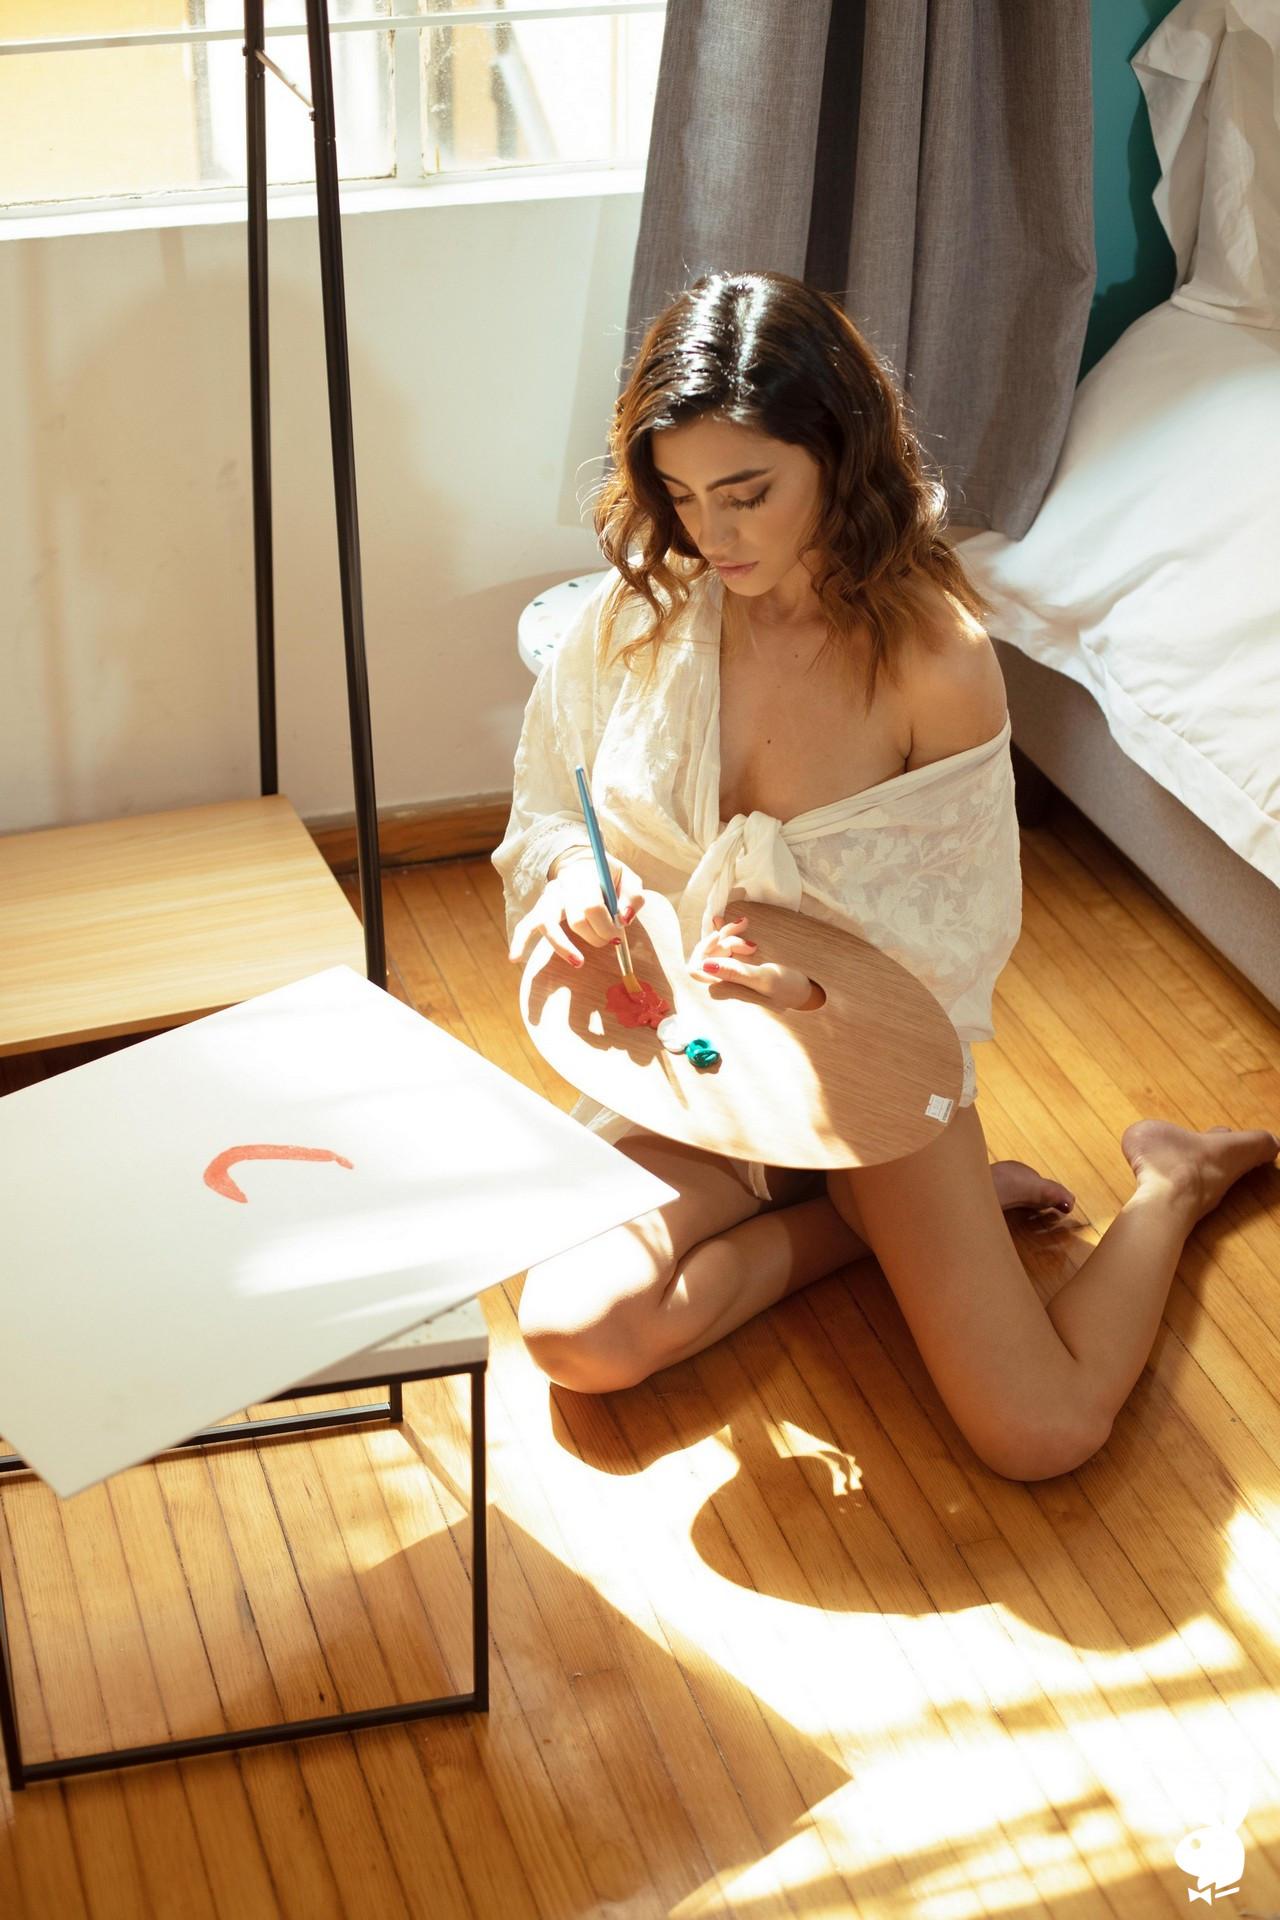 Danny Hernandez In State Of The Art Playboy Plus (3)